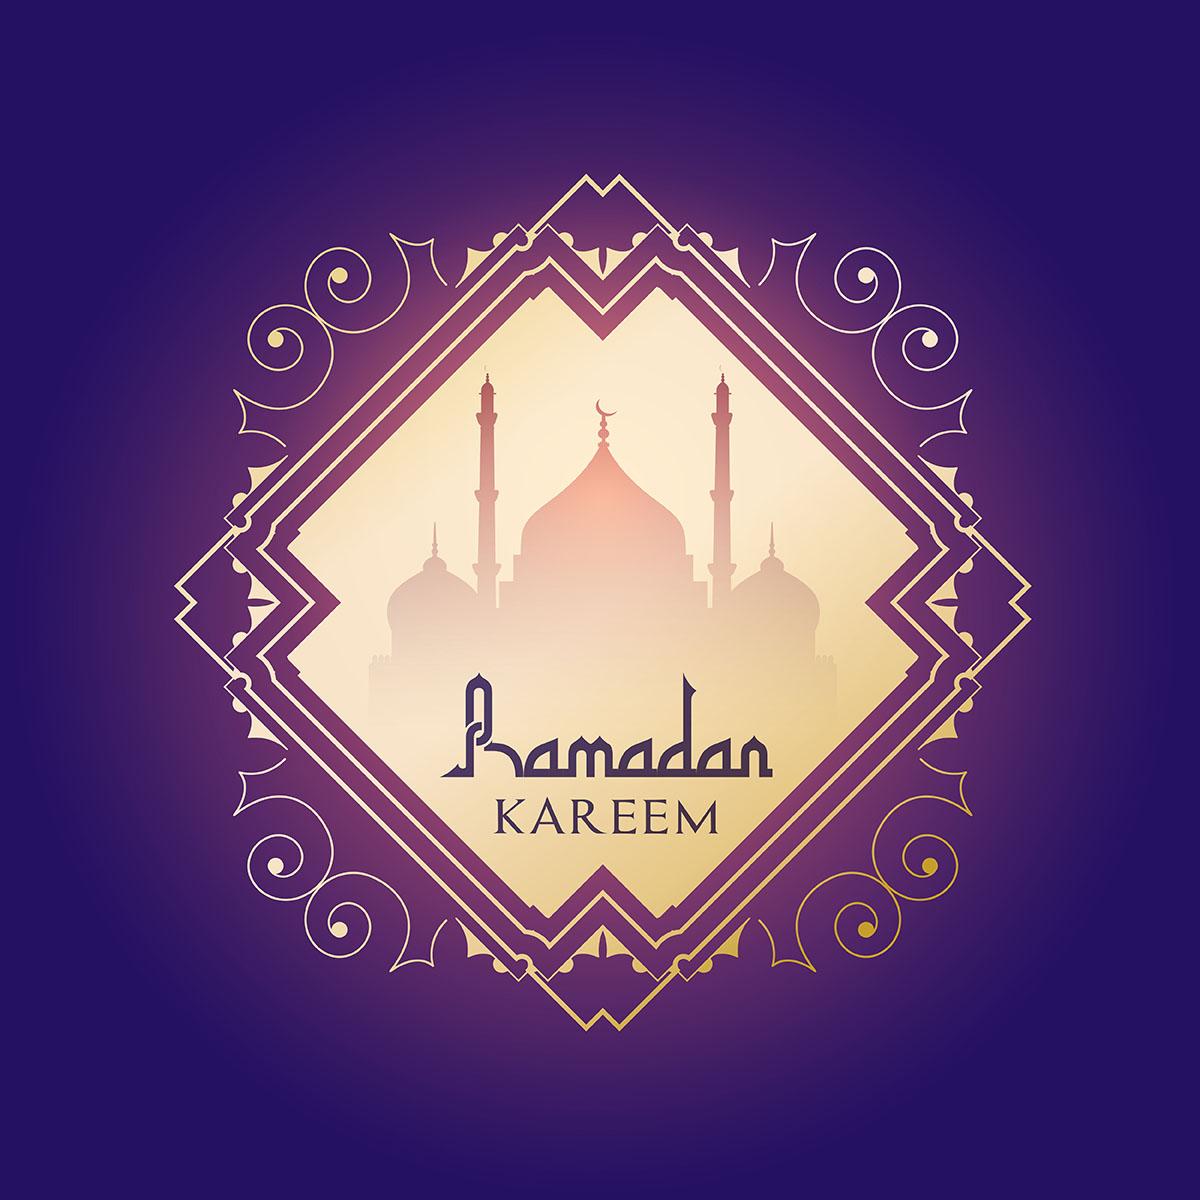 Ramadan kareem background - Download Free Vector Art